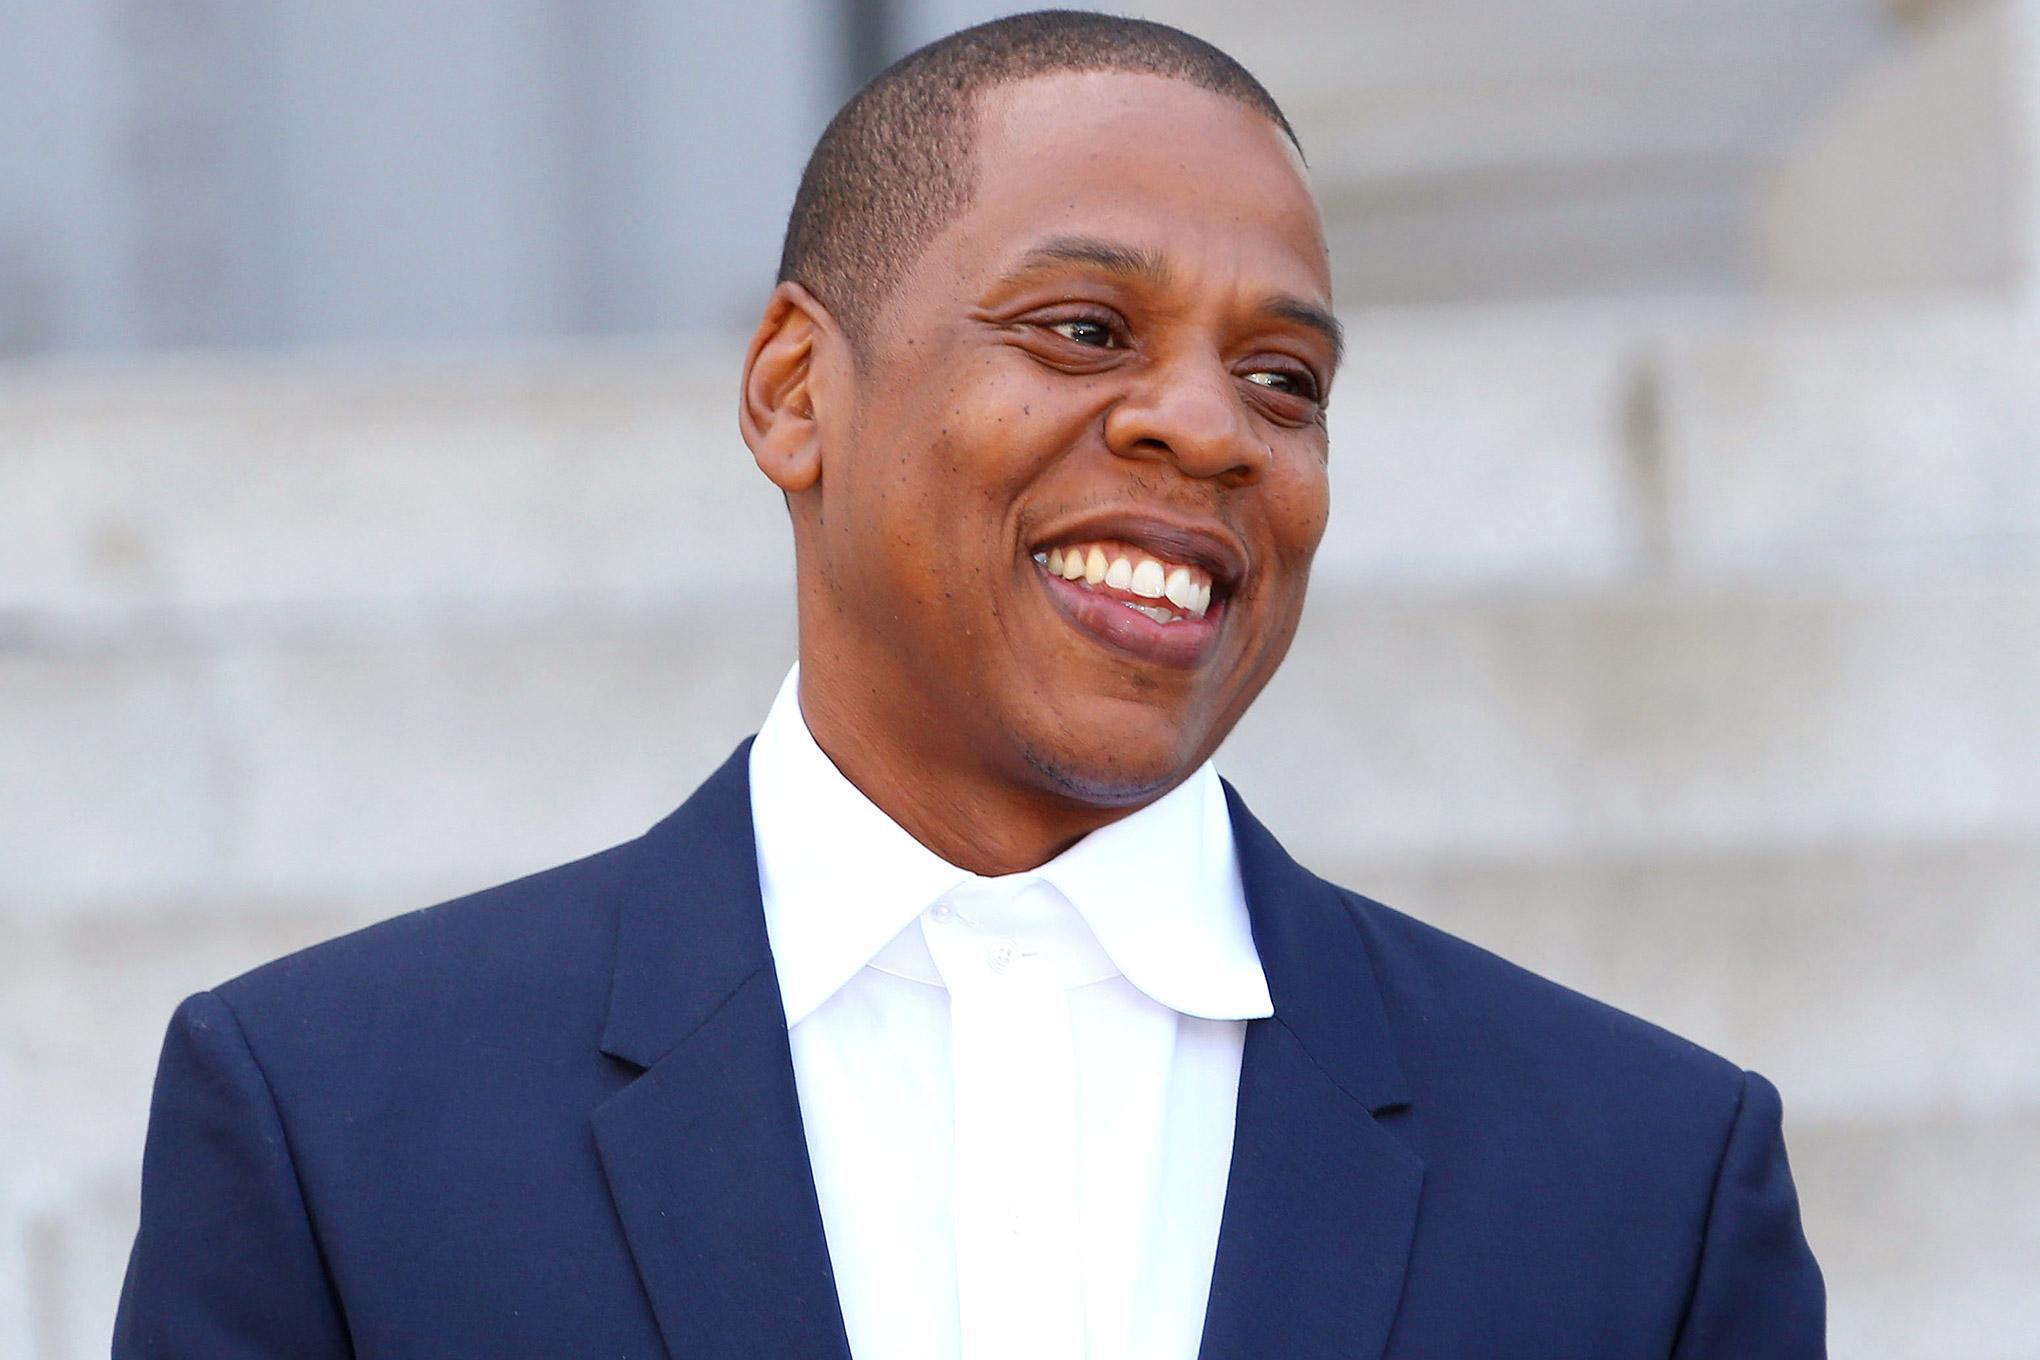 RT @GGNewMusic: Jay Z is calling TIDAL subscribers to personally thank them http://t.co/5zaJT9yRuL http://t.co/BcB3QCSDvJ